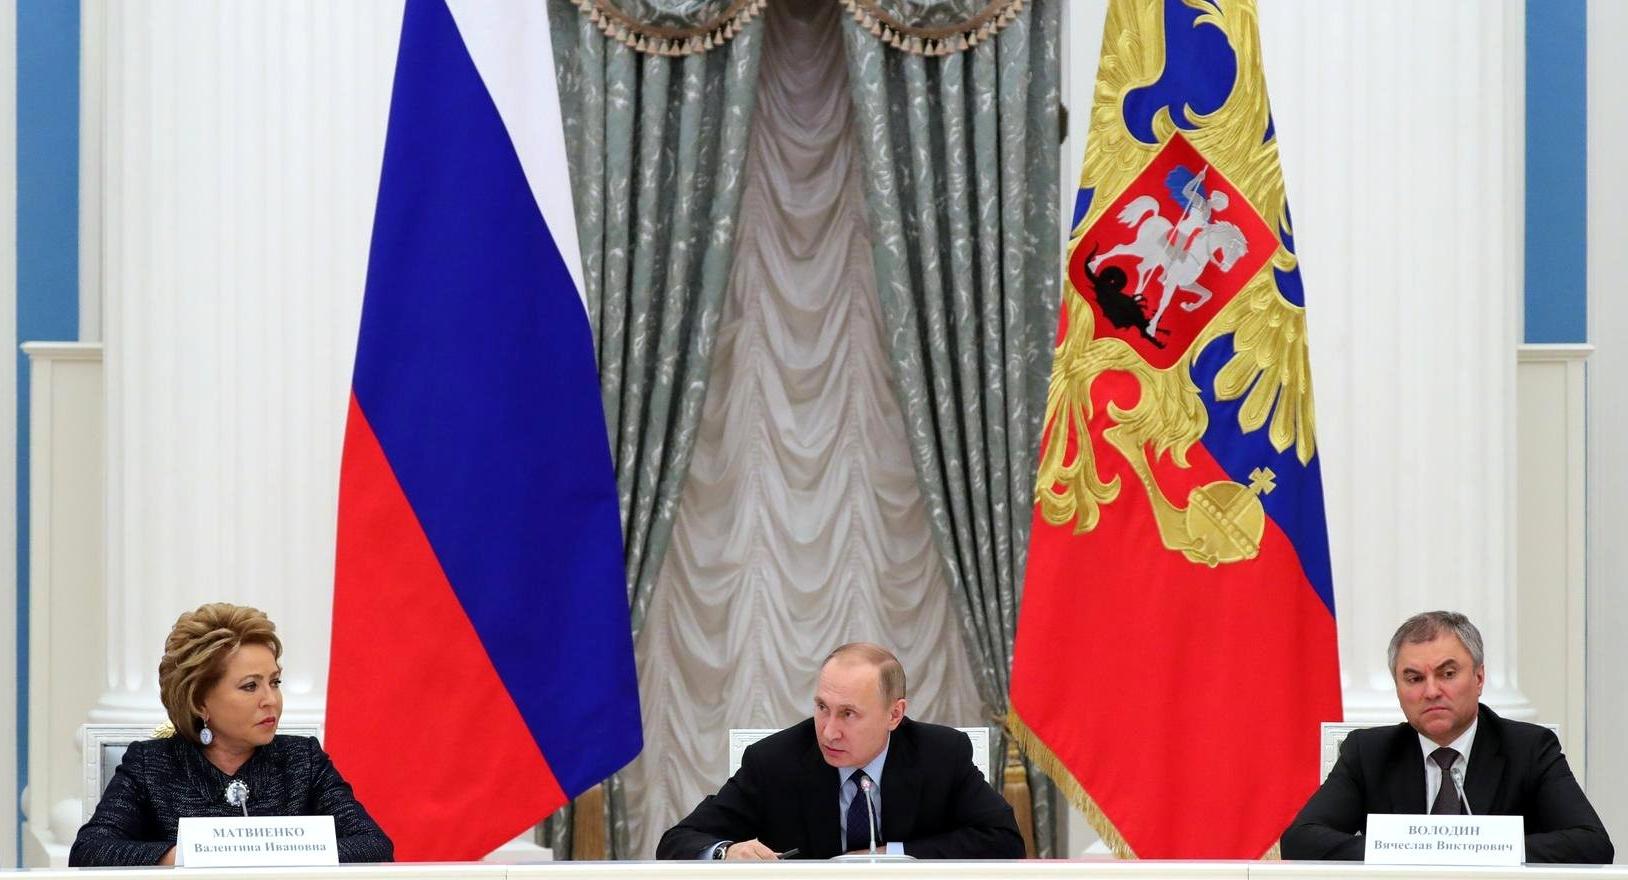 Матвиенко, Путин, Володин